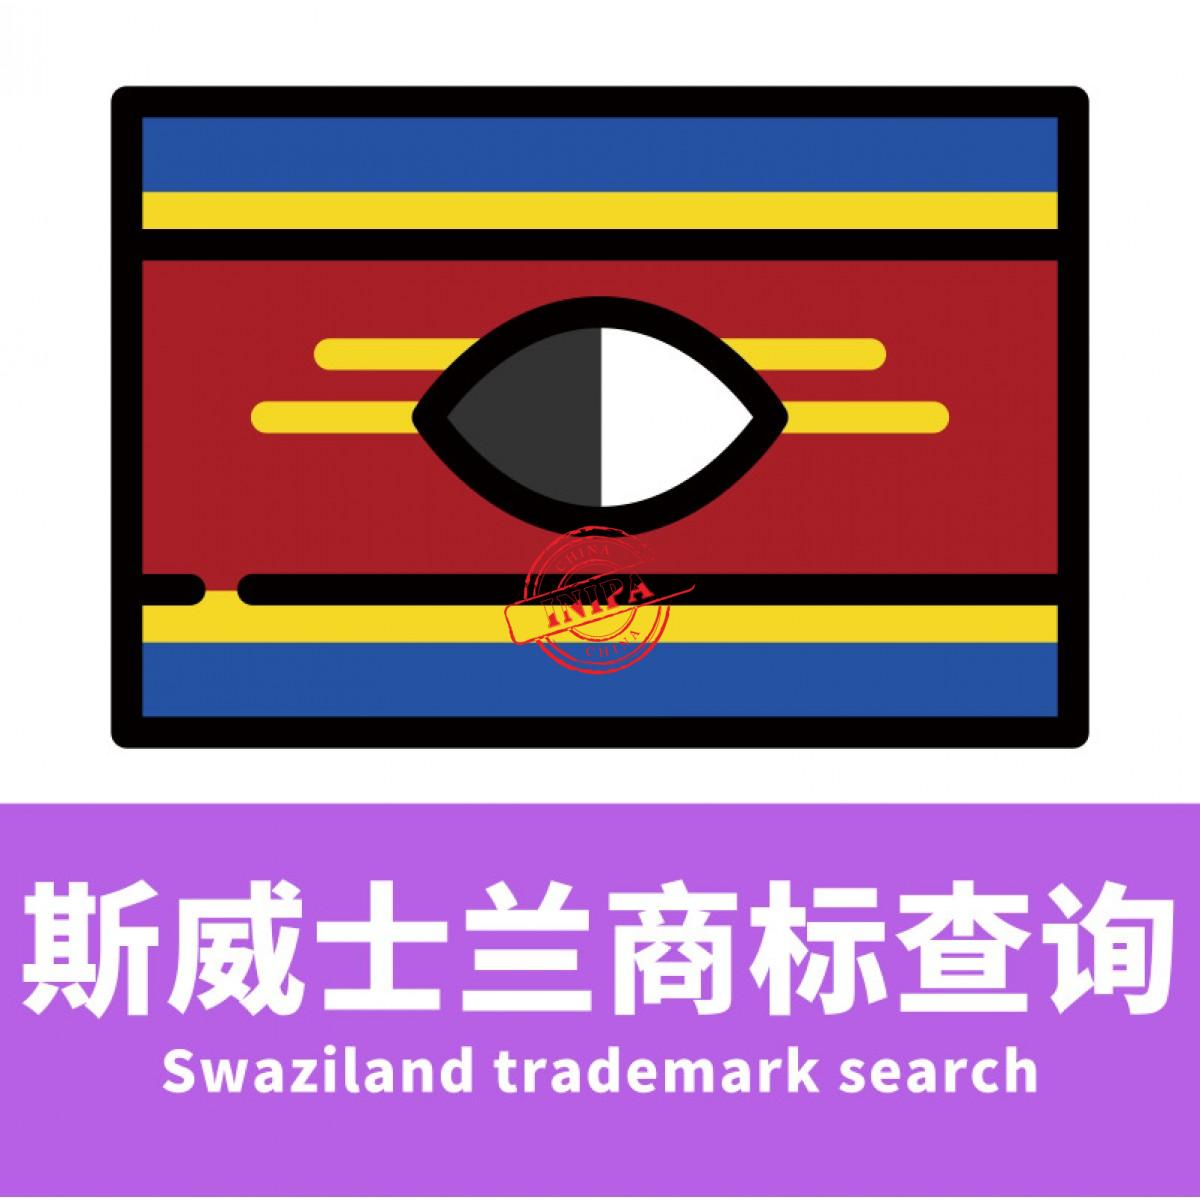 斯威士兰商标查询/Swaziland trademark search